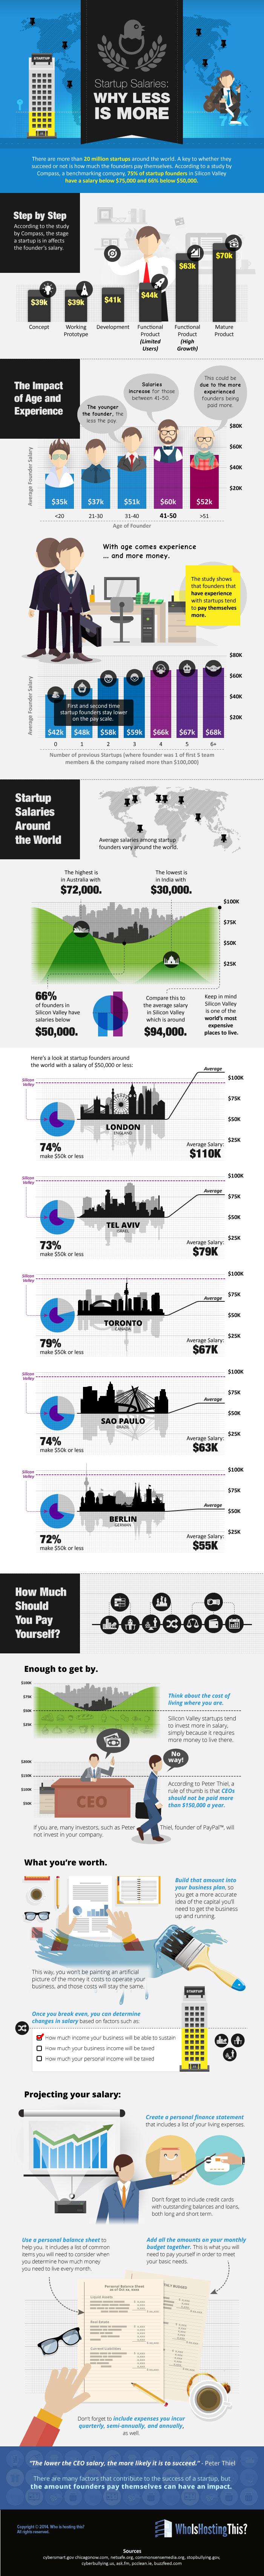 startups-salarios